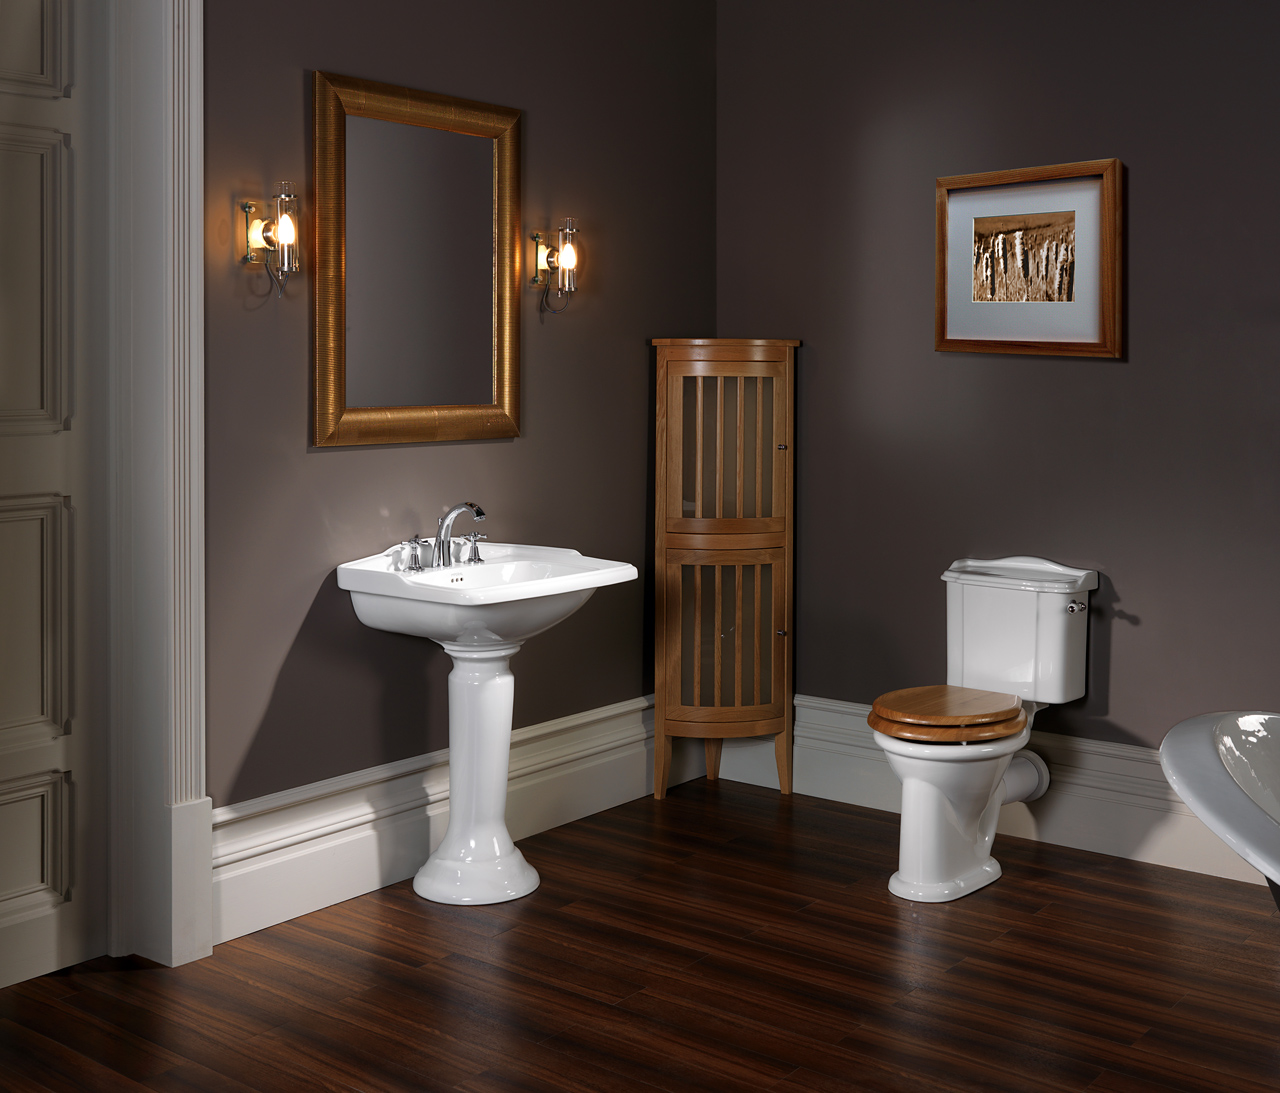 Classic Bathrooms: Imperial Bathrooms - Delille-Main-Set_retouch